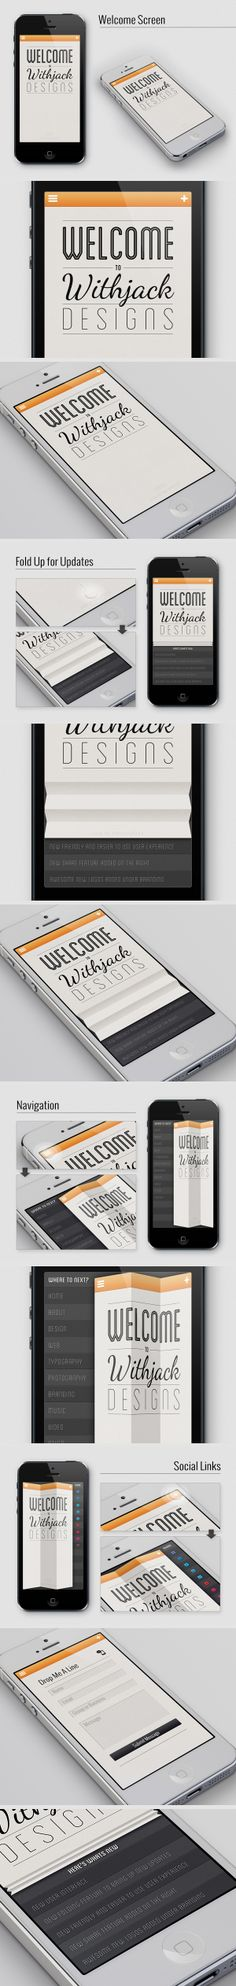 http://www.getwebassist.com/interface-design/amazing-app-ui-interface-designs-for-the-iphone/?utm_source=rss_medium=rss_campaign=amazing-app-ui-interface-designs-for-the-iphone